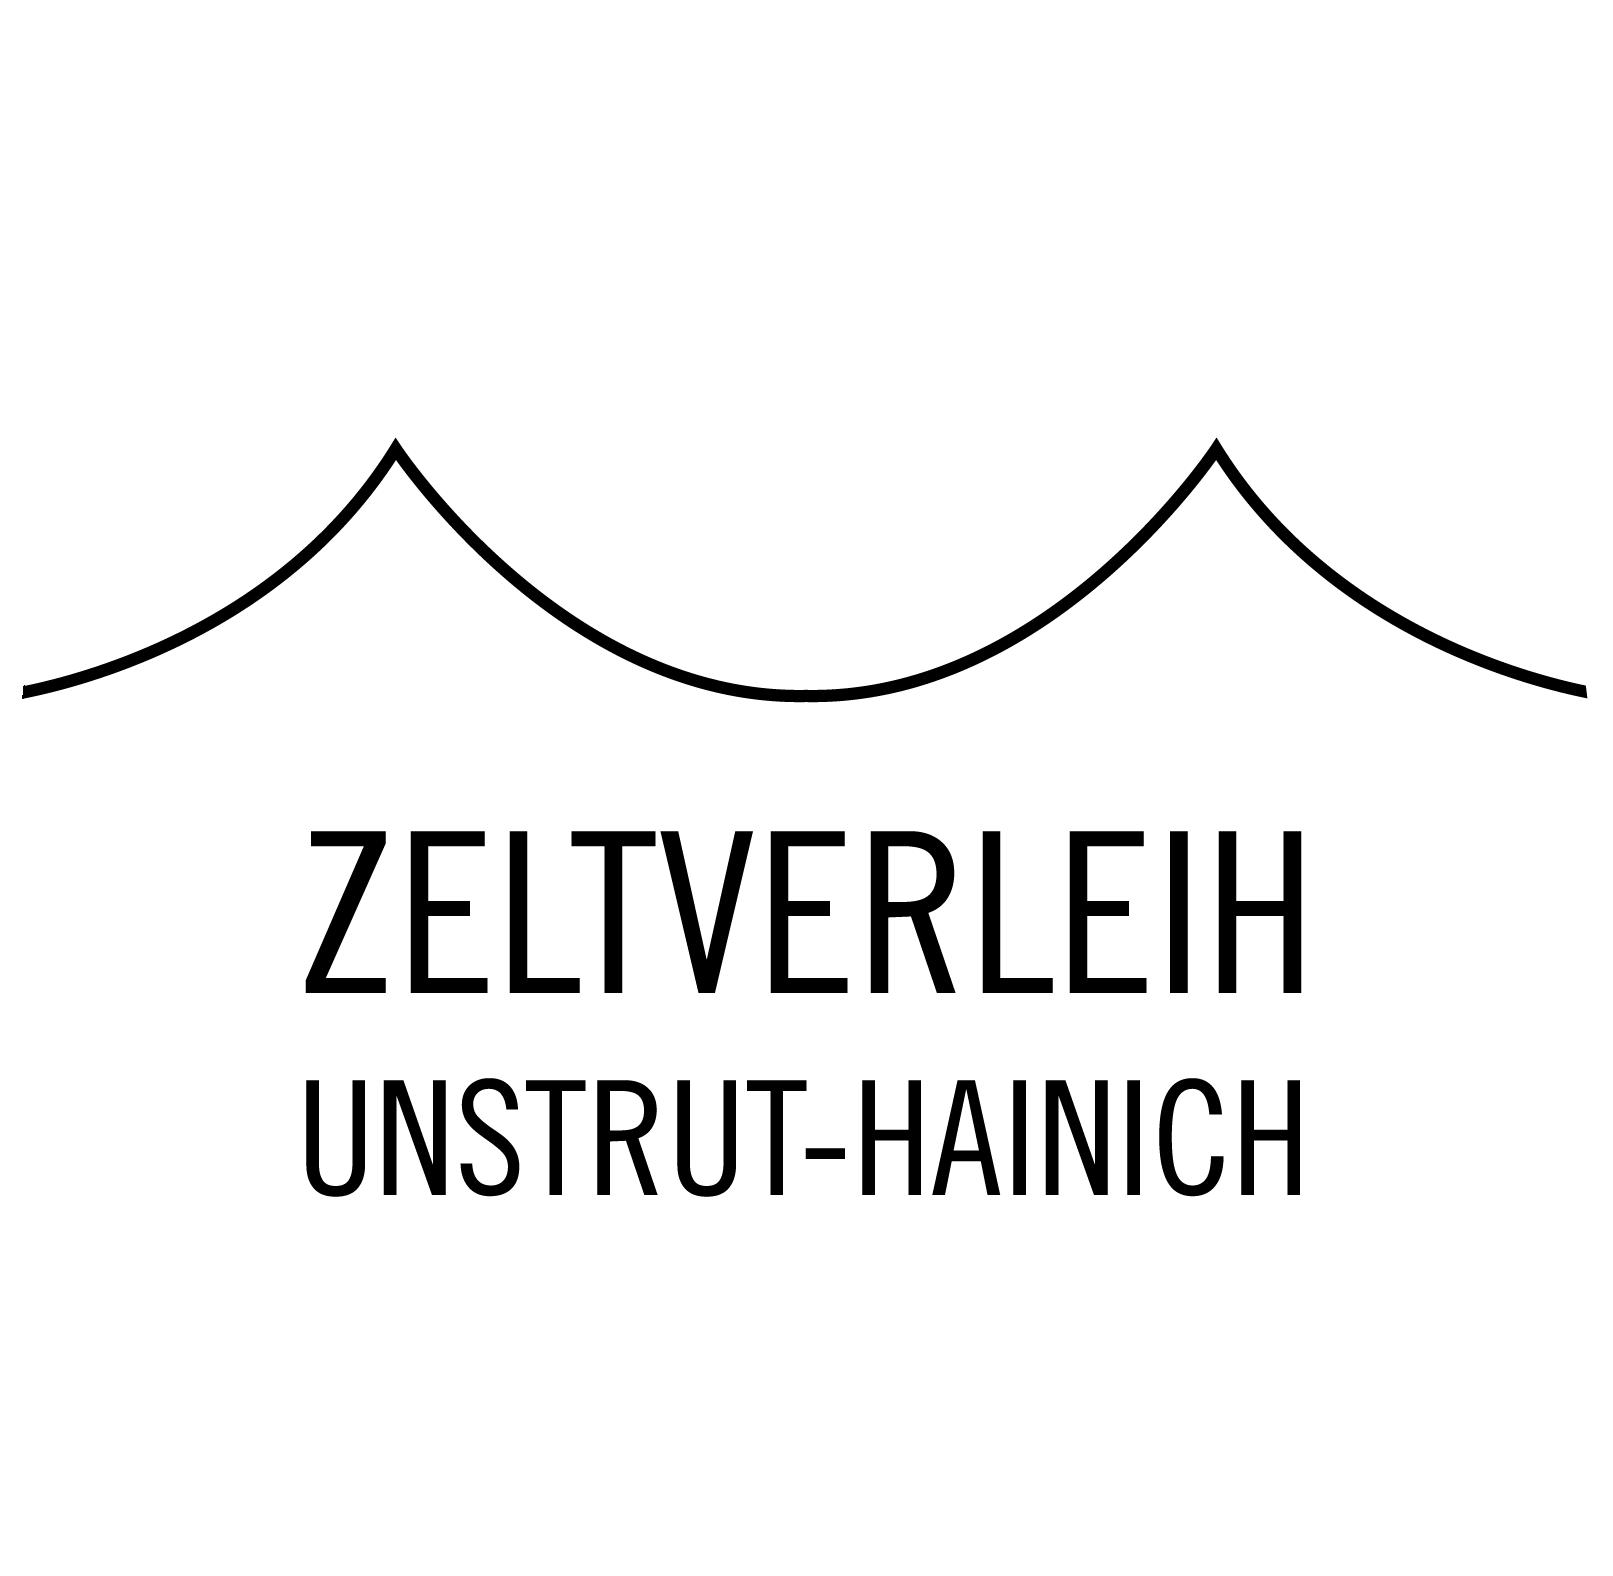 Logo Zeltverleih Unstrut-Hainich